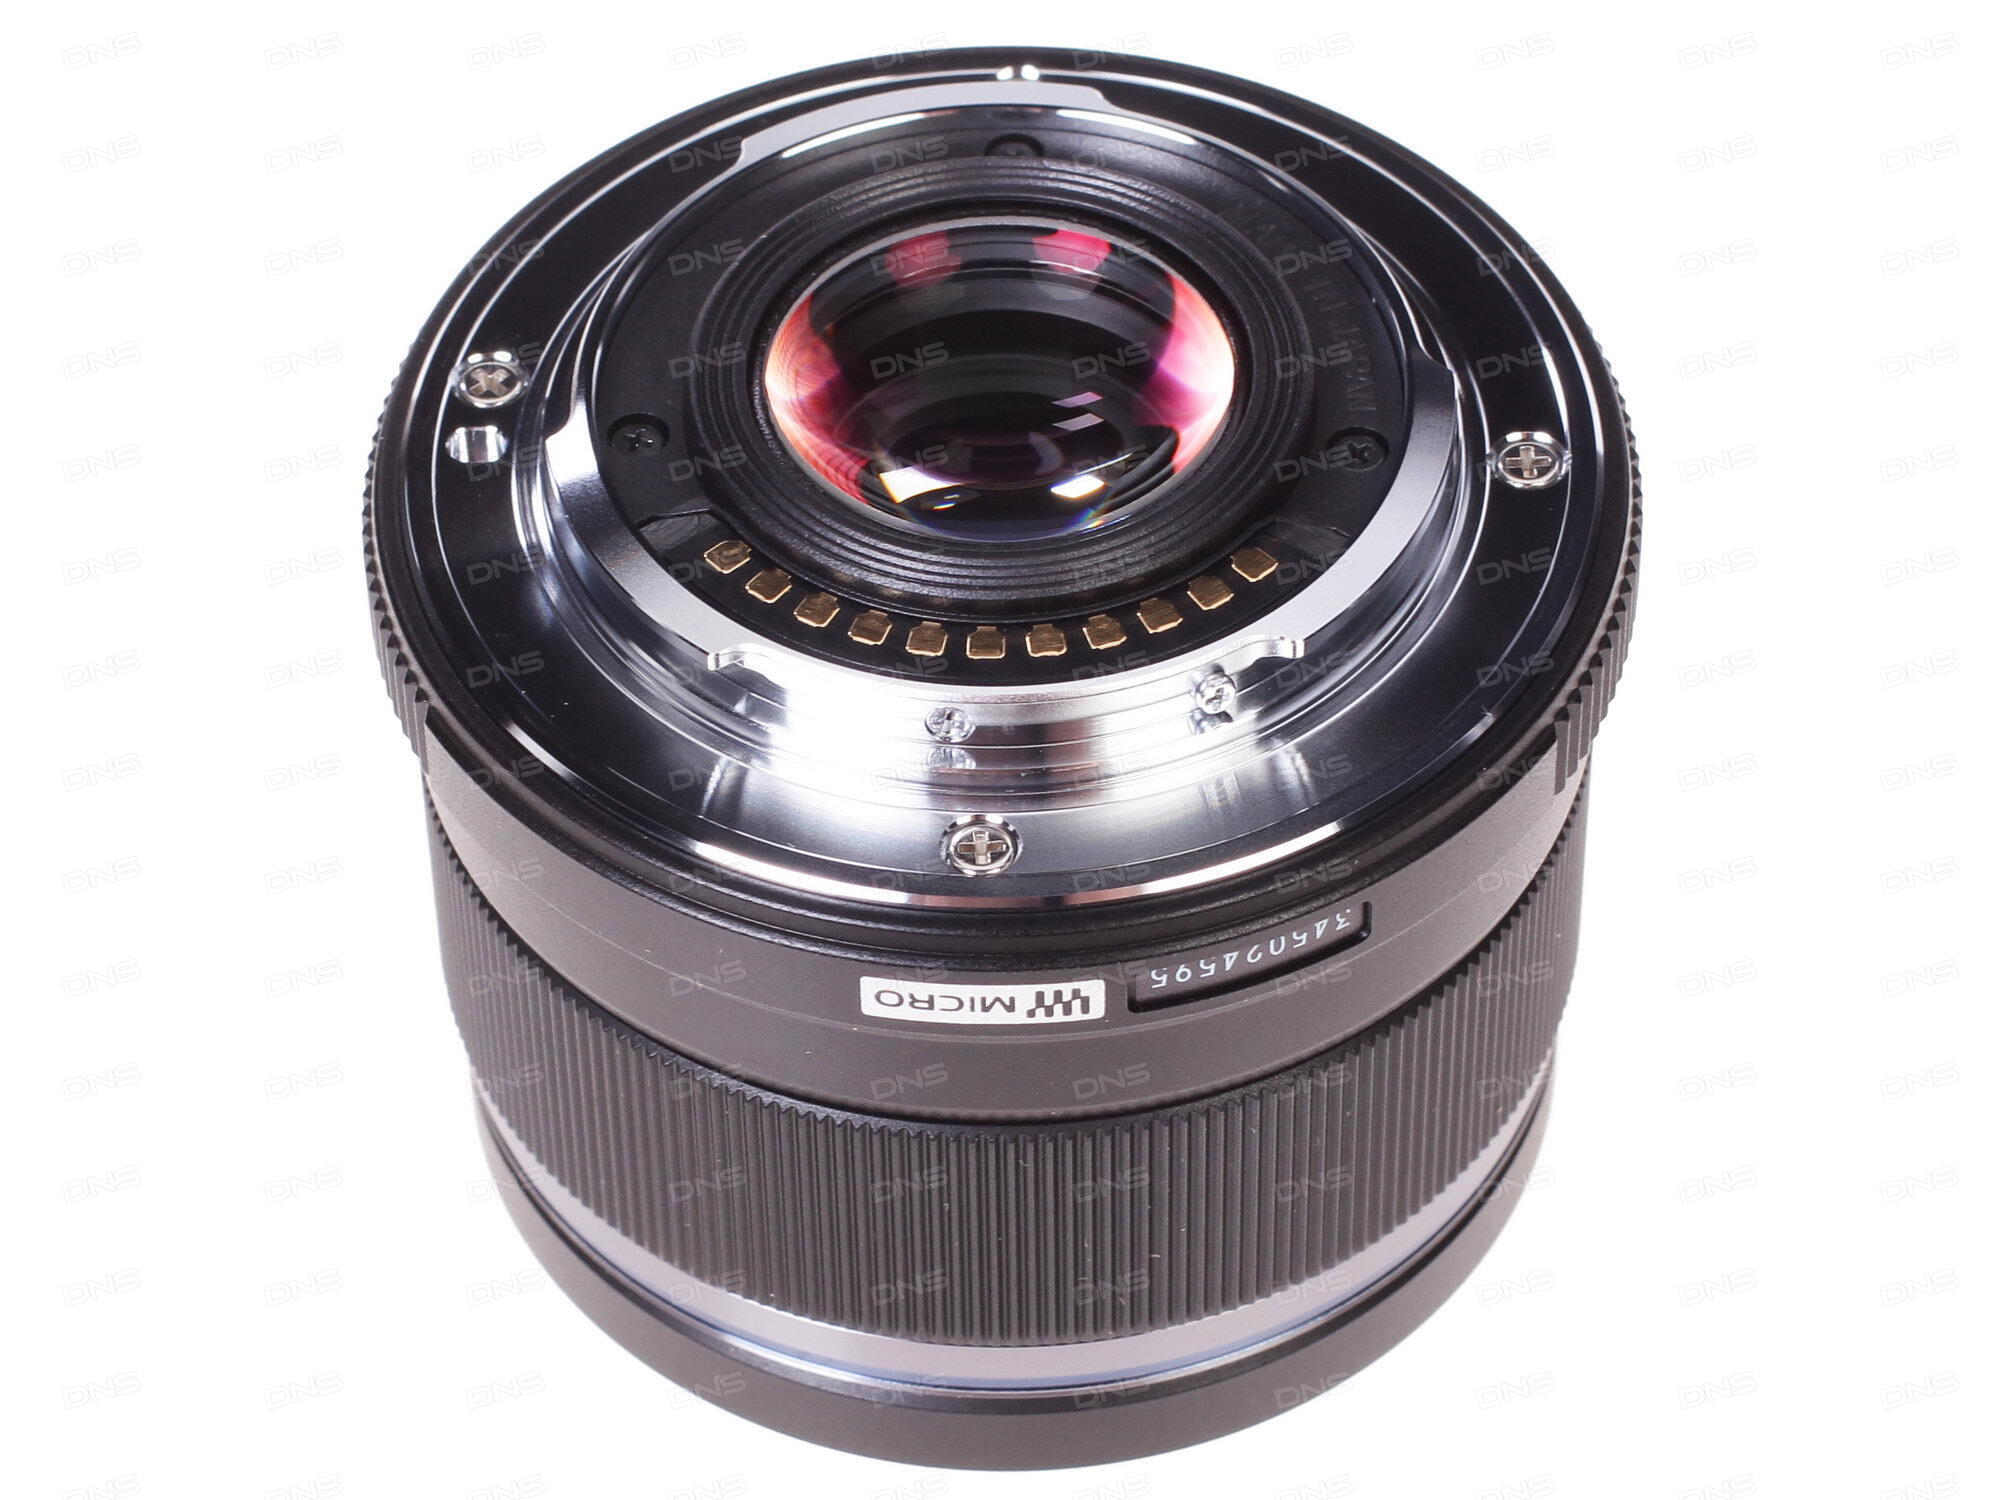 Объектив Olympus M.Zuiko ED 45 mm f/1.8 Micro for PEN Silver*